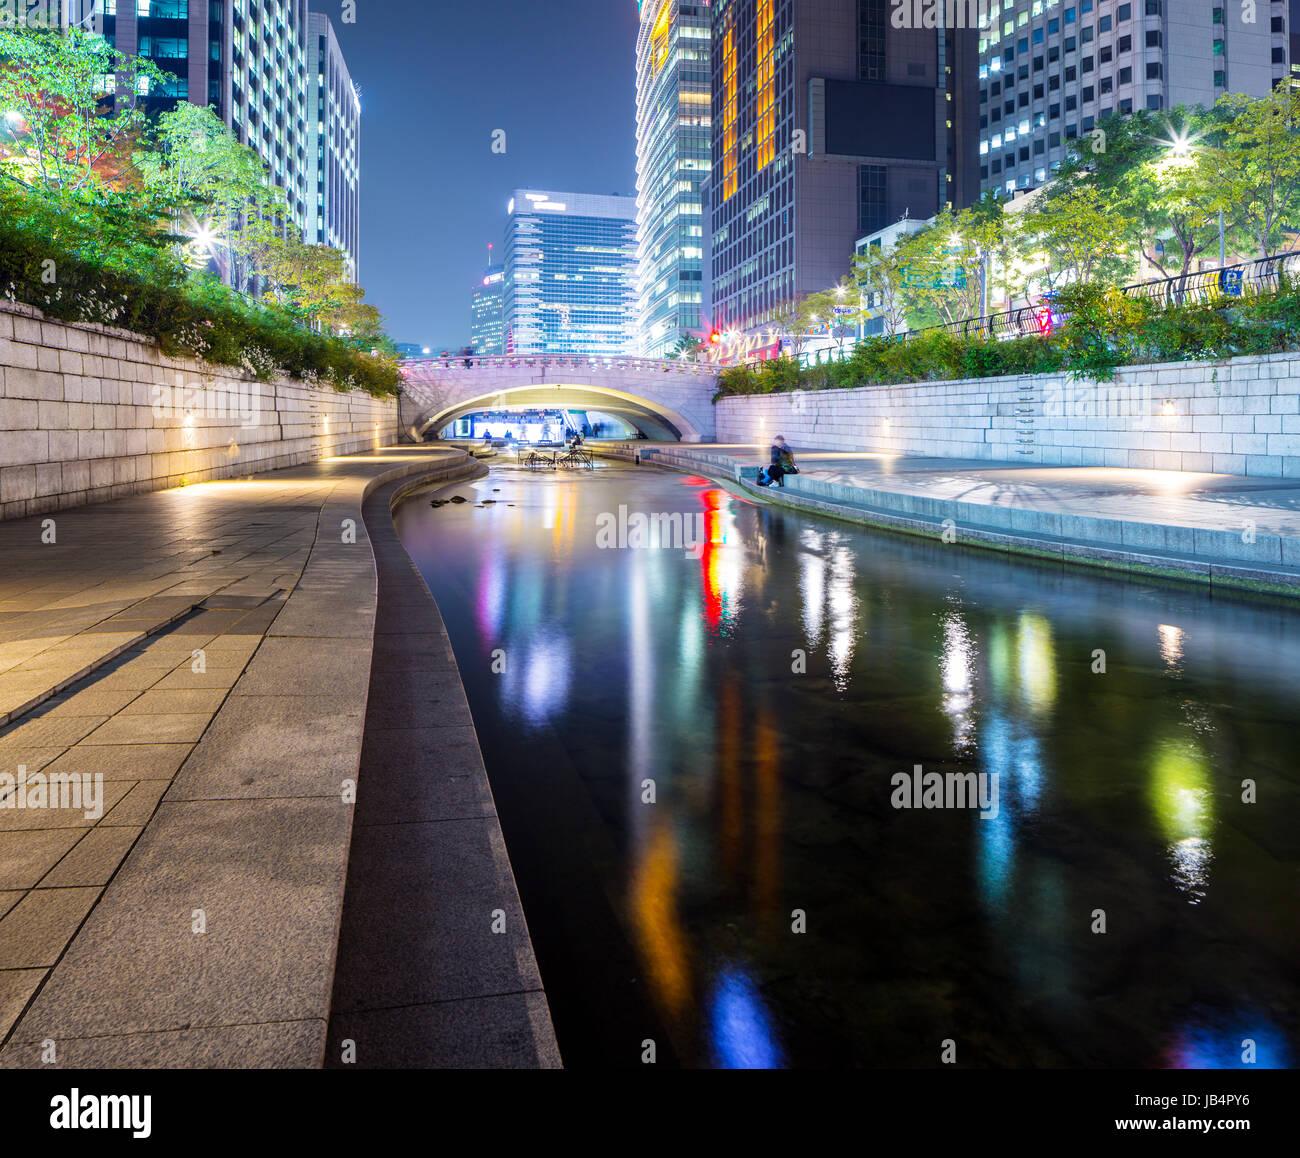 South Korea at Cheonggyecheon Stream - Stock Image